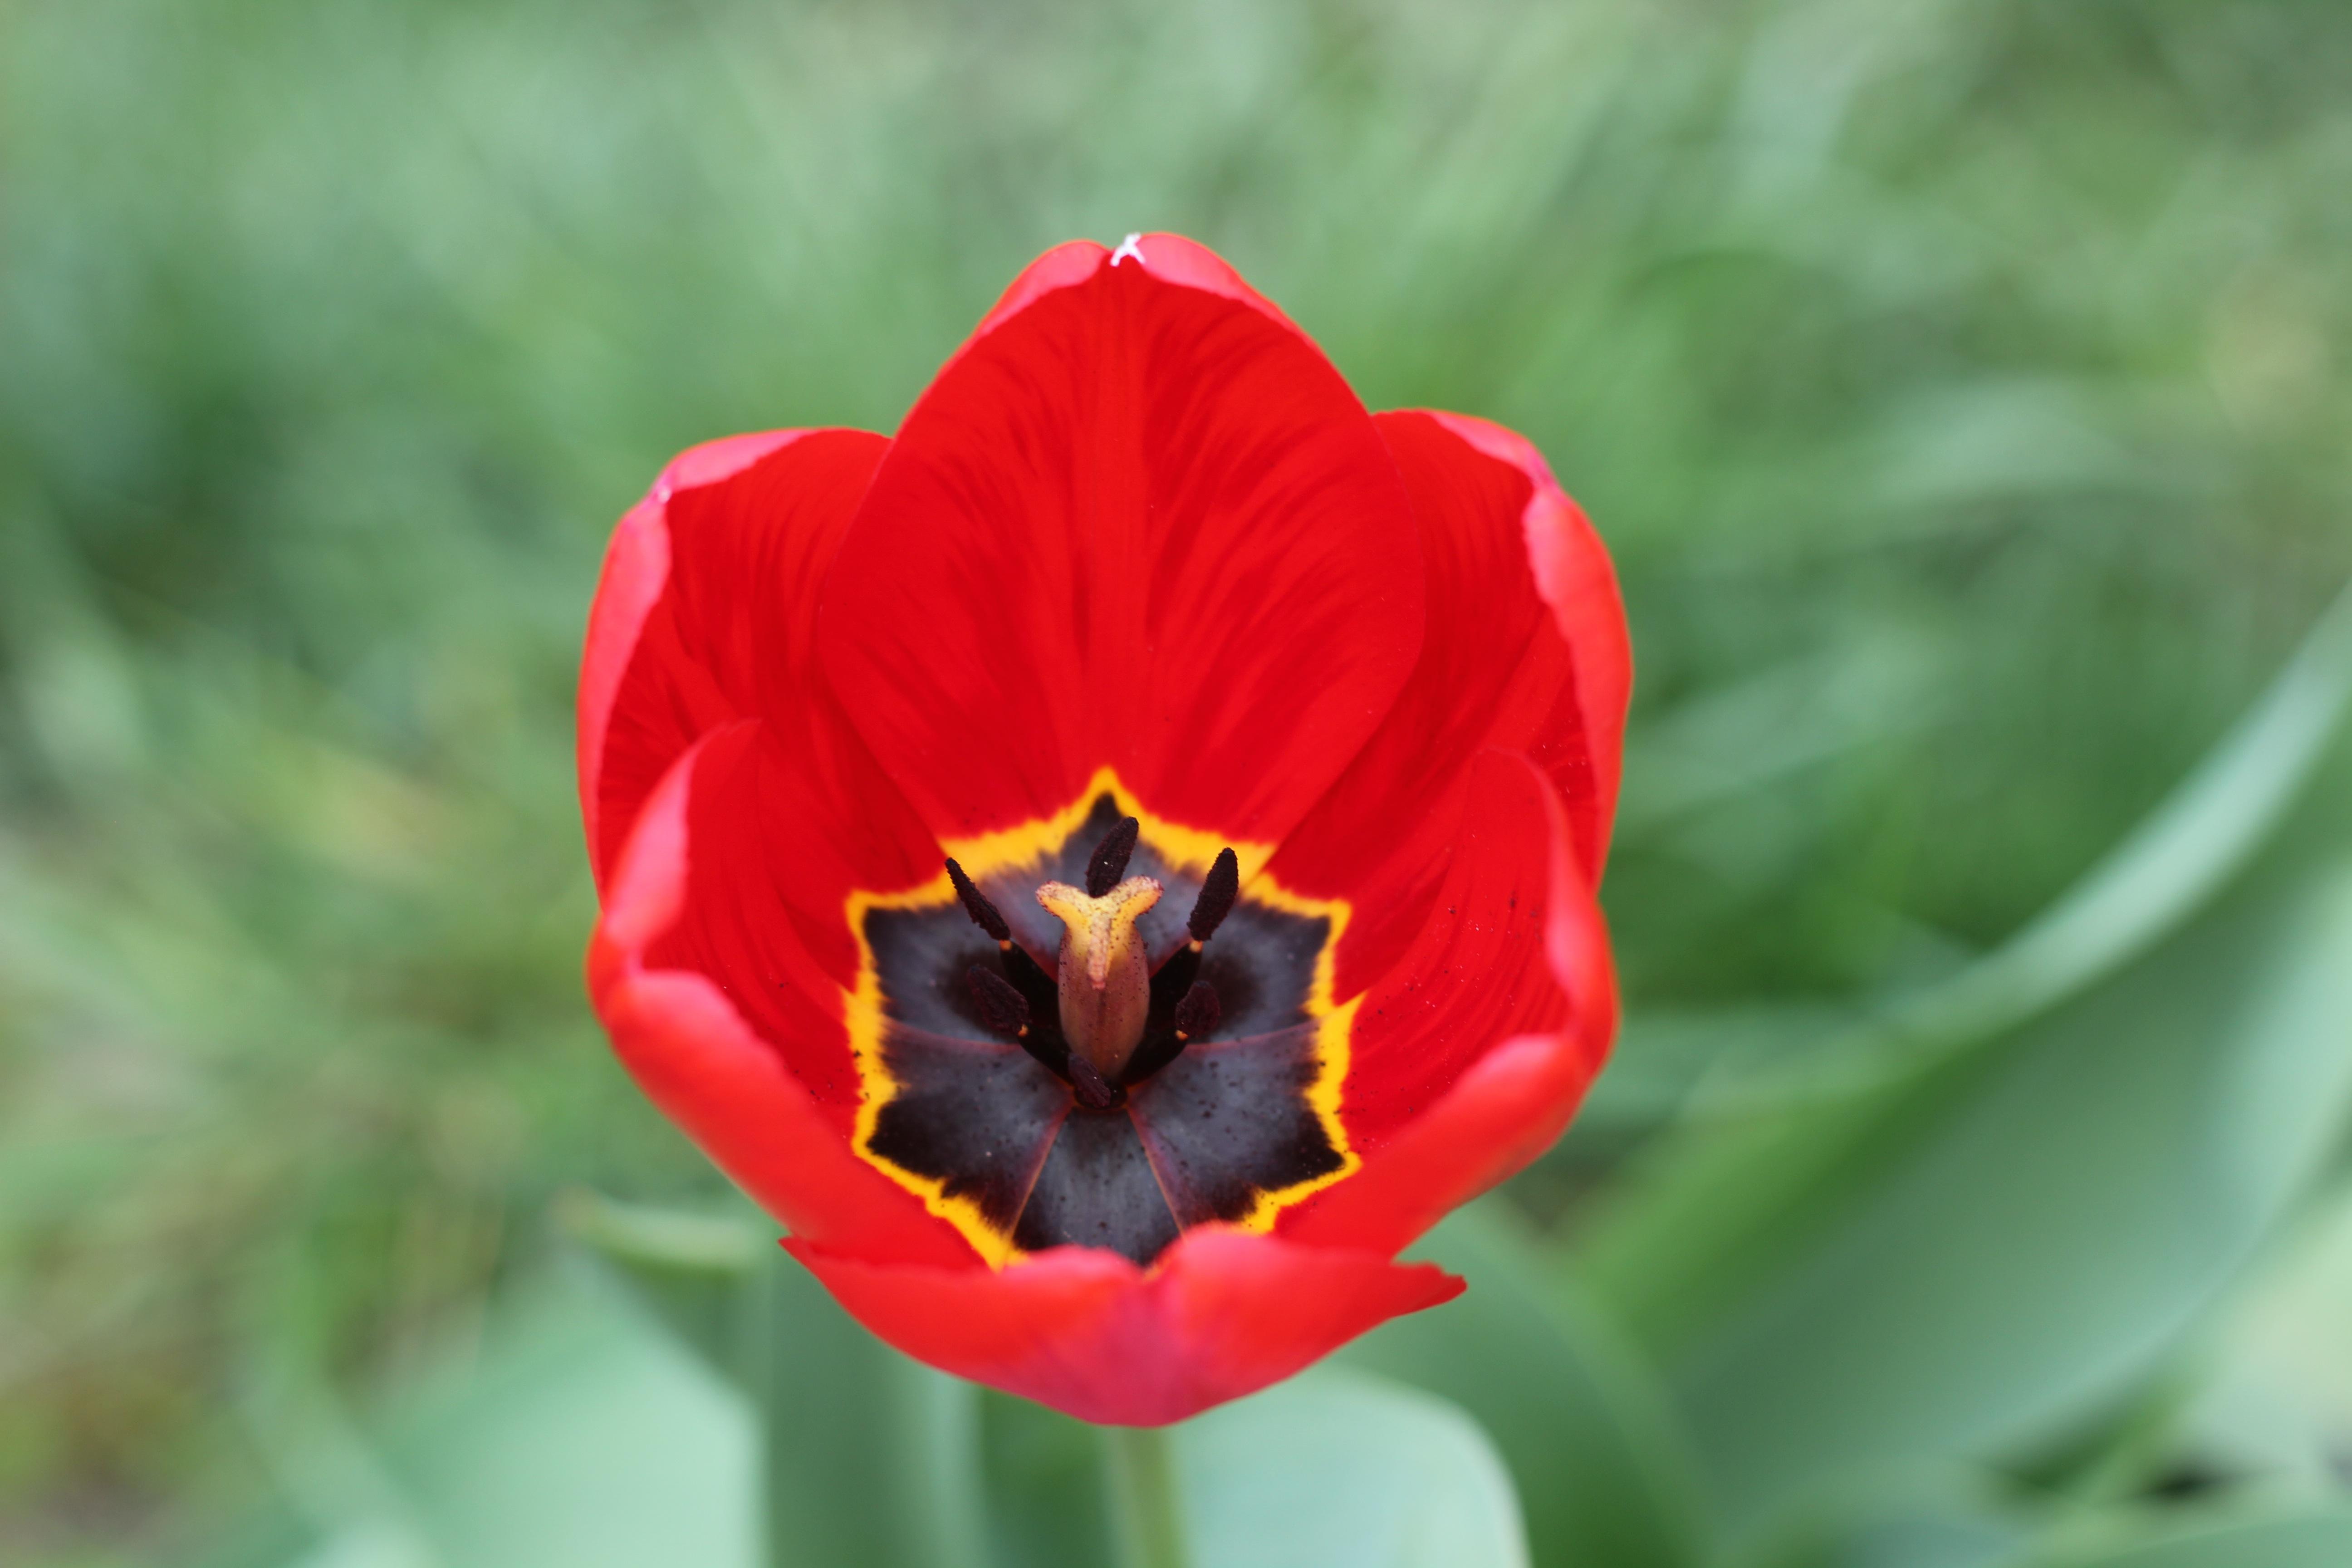 Free Images Nature Petal Tulip Spring Flora Plants Flowers